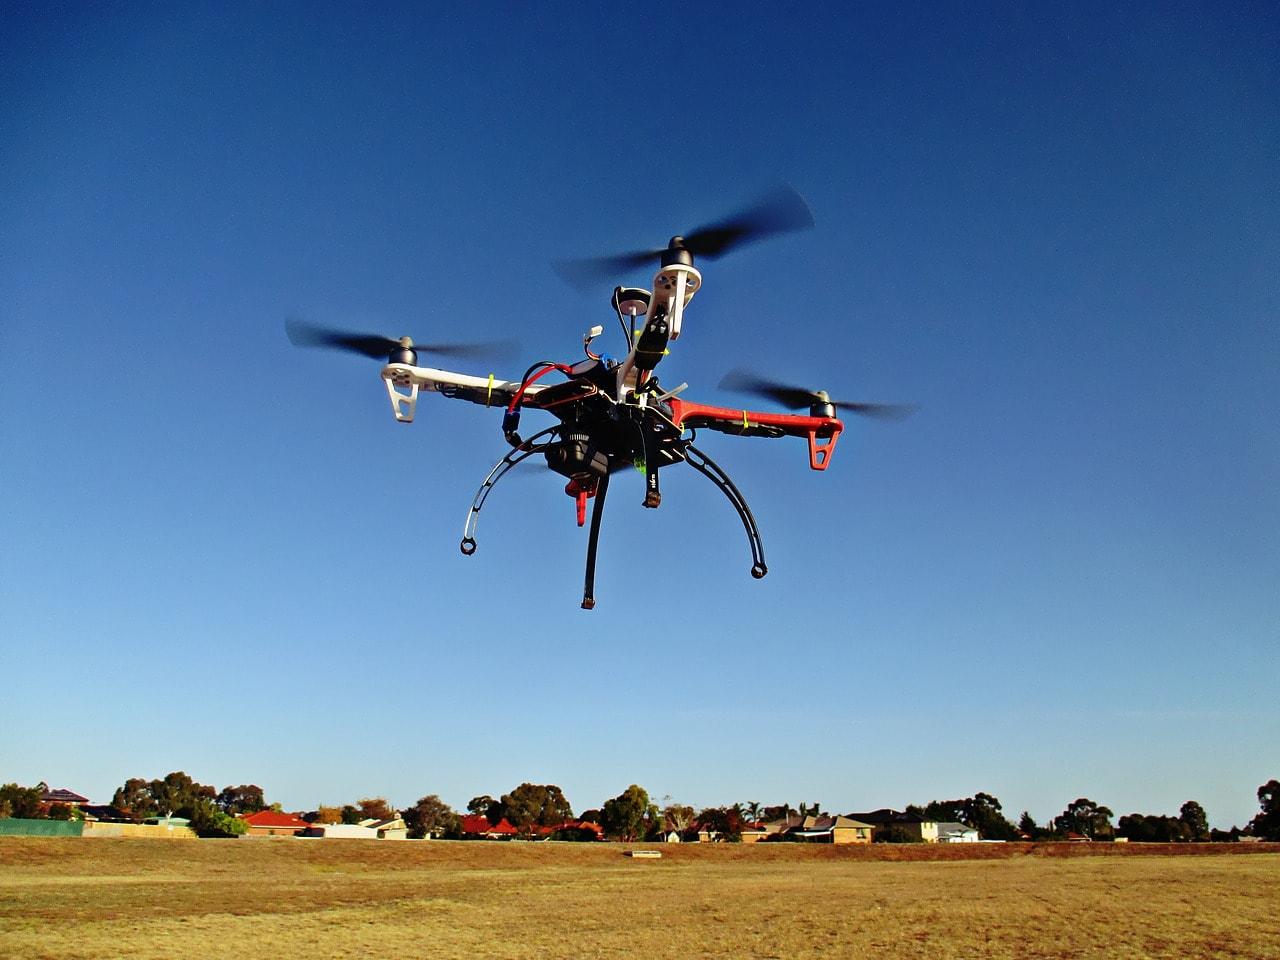 drone-784310_1280.jpg